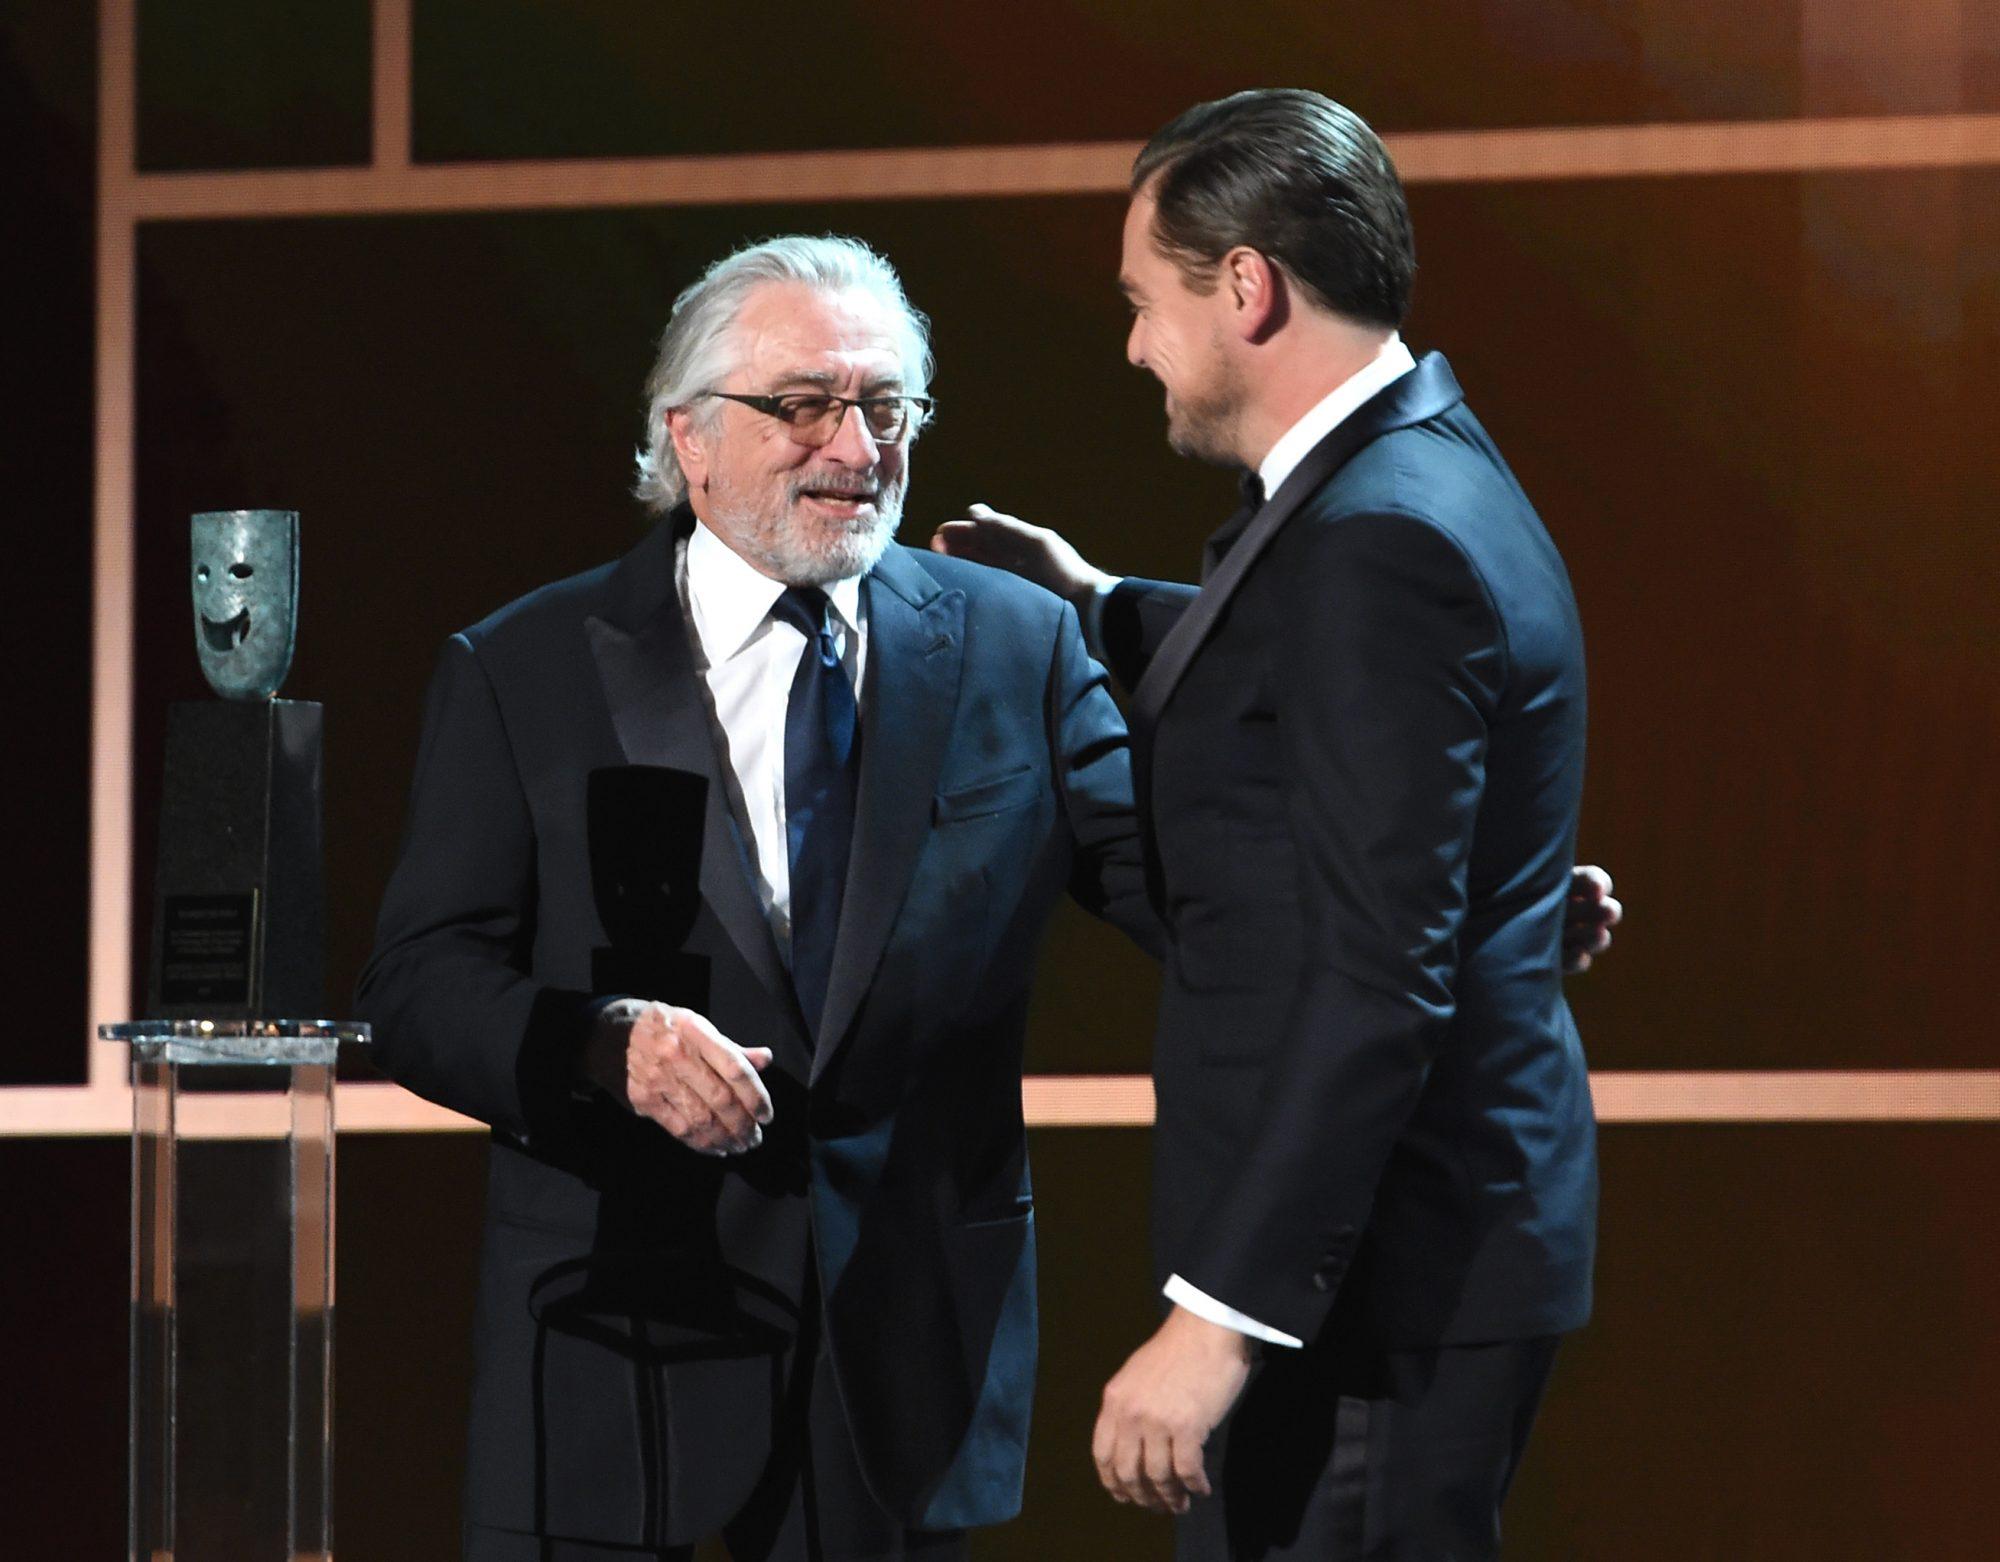 26th Annual Screen ActorsGuild Awards - Inside